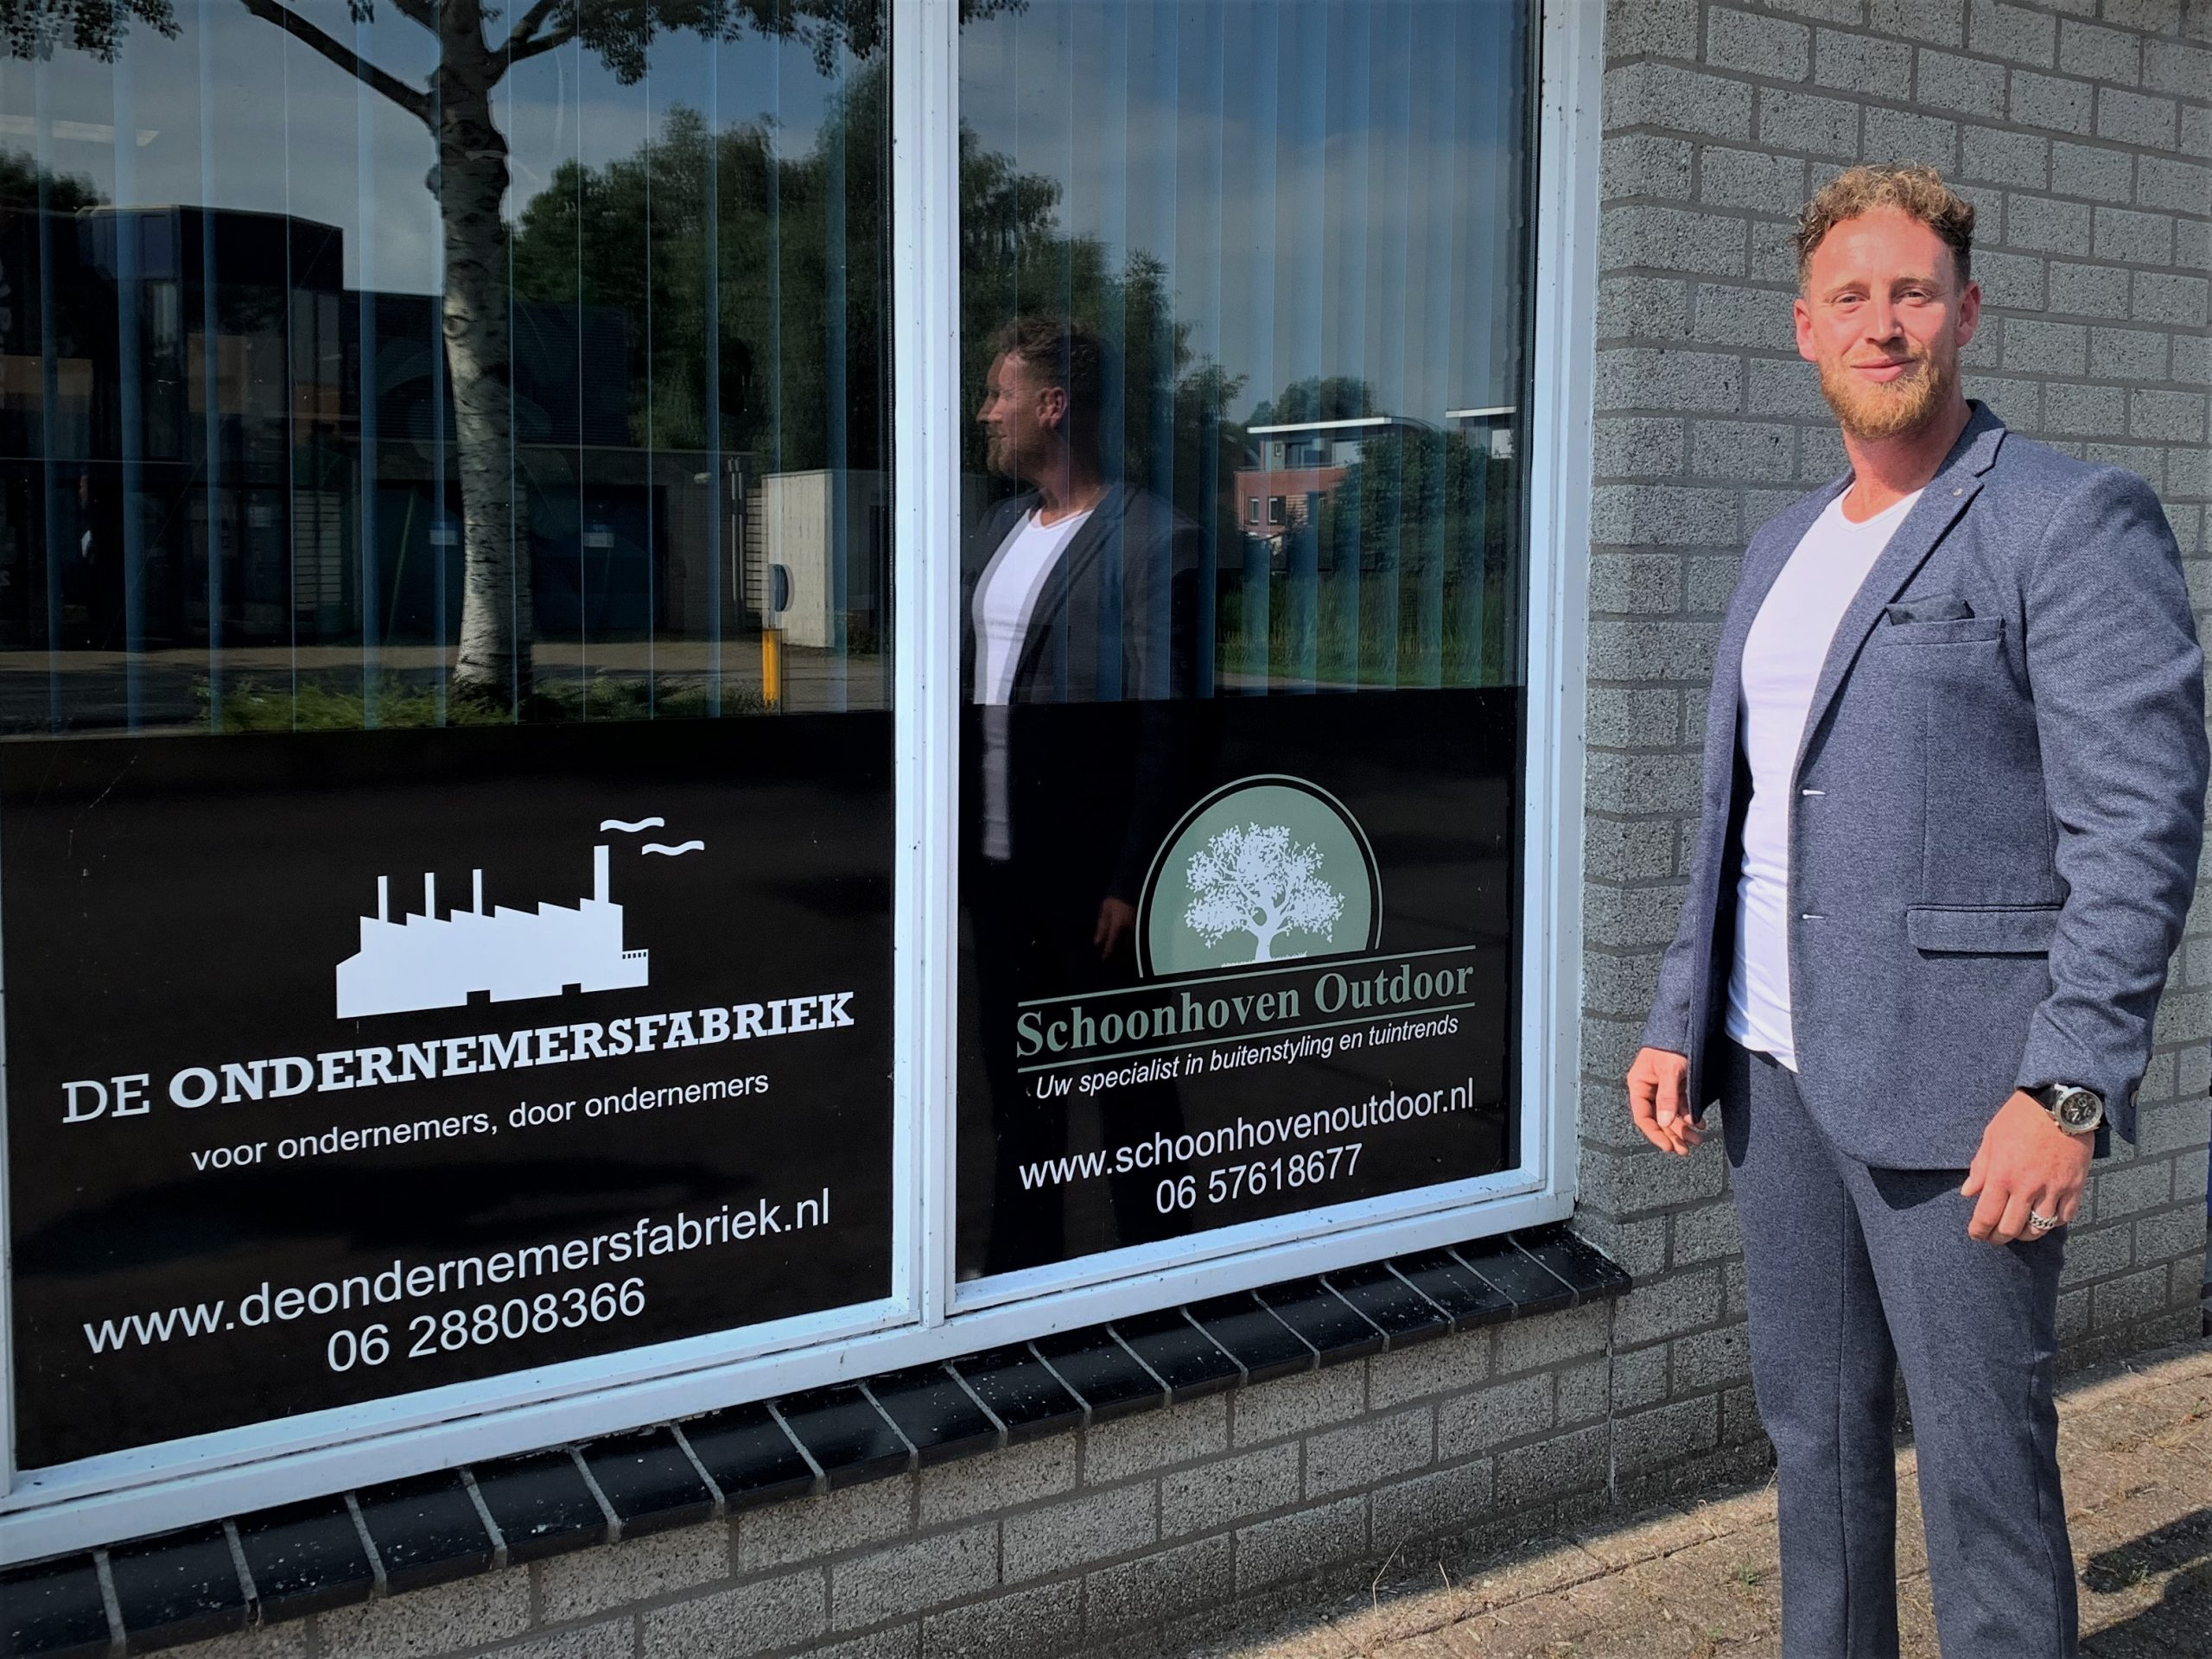 'Ondernemersfabriek' in Schoonhoven steeds voller met enthousiaste ondernemers